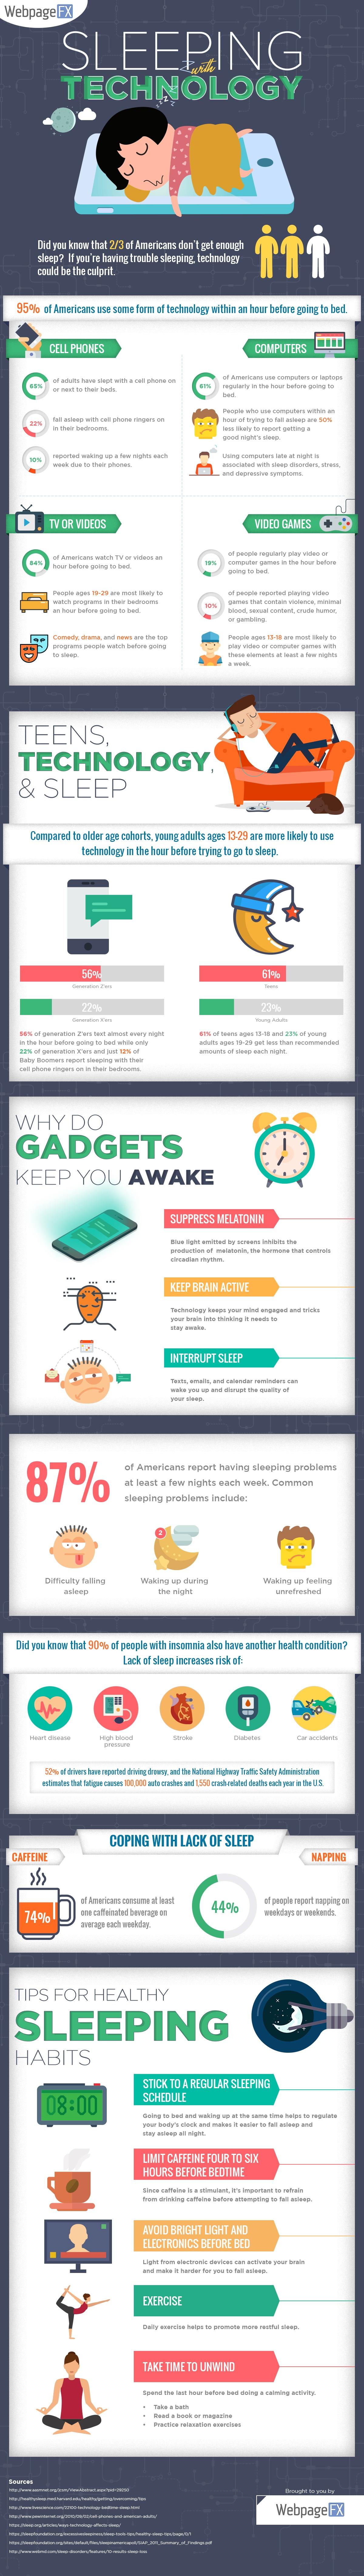 technology-and-sleep-infographic-1-1.jpg